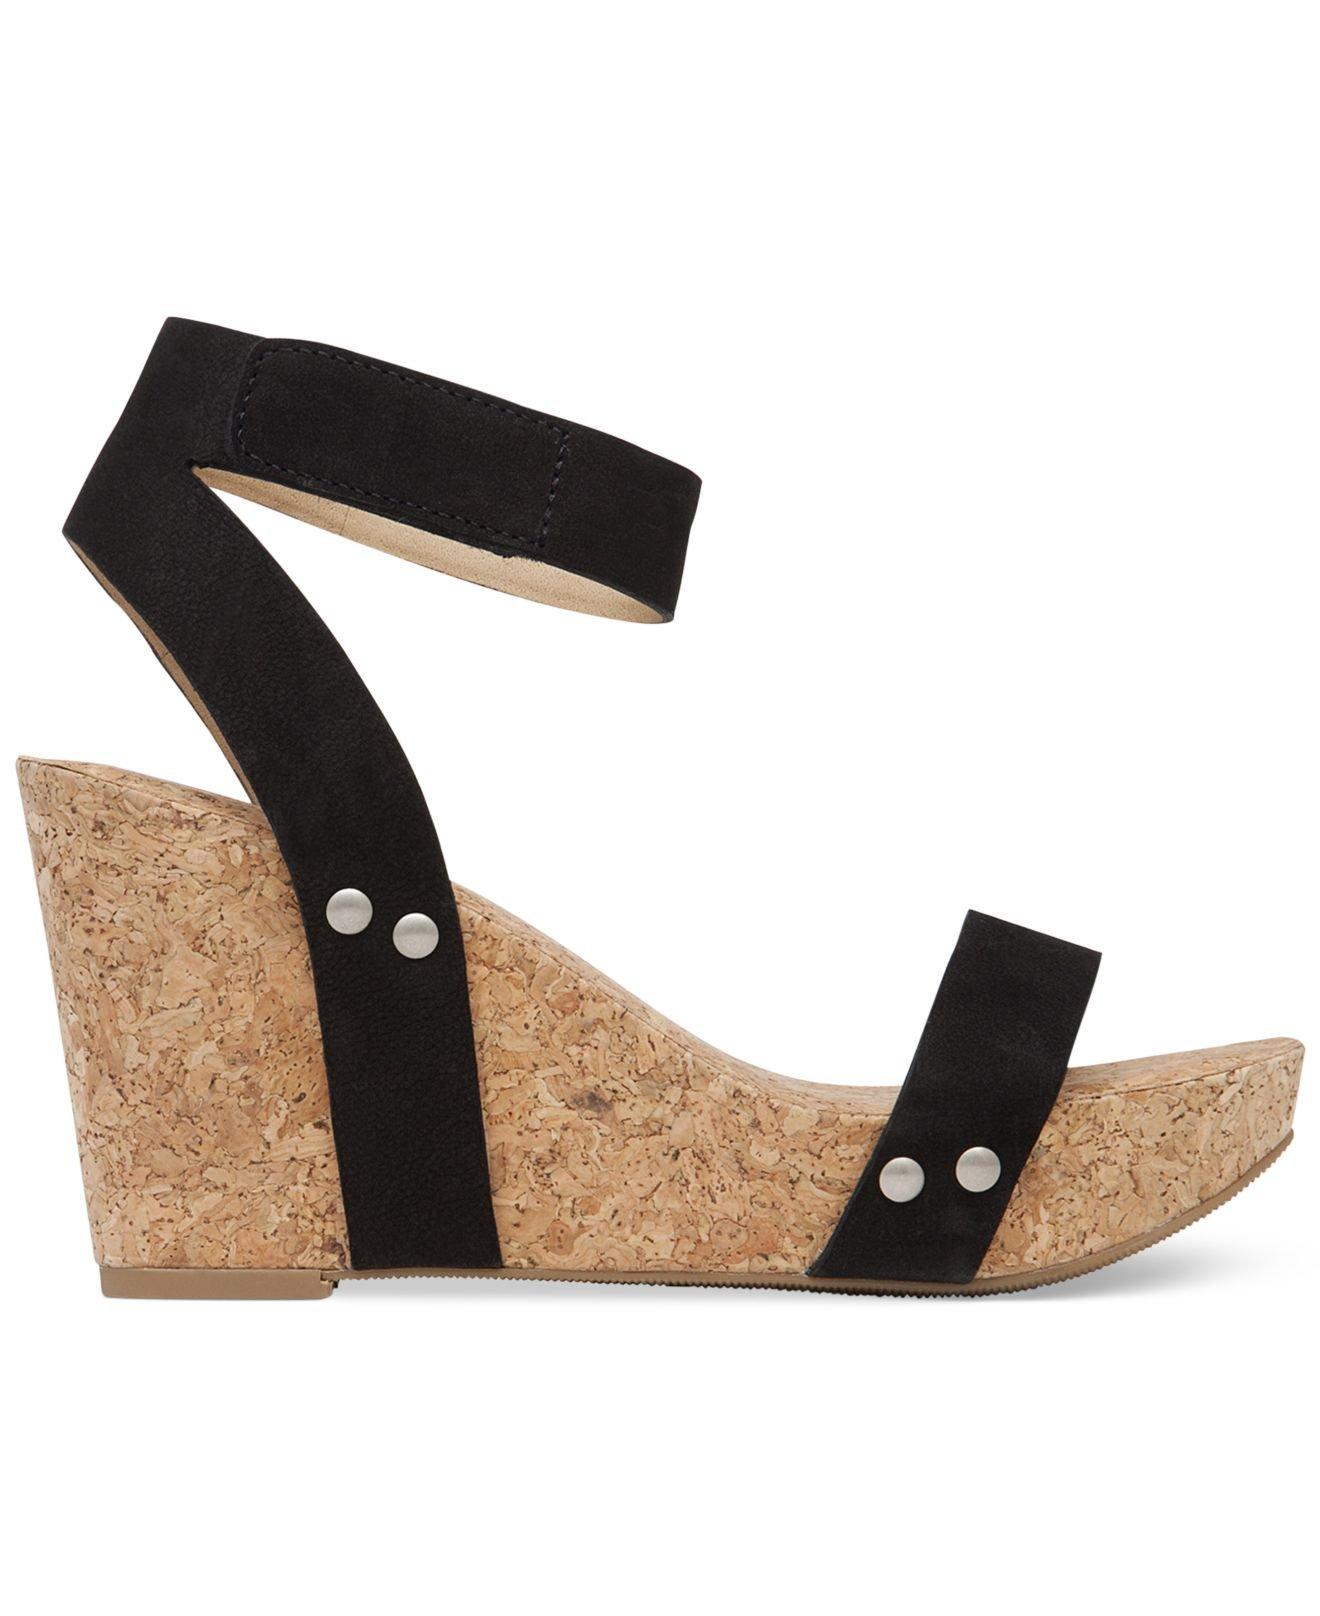 4a0f39b23563 Lyst - Lucky Brand Women s Mcdowell Cork Platform Wedge Sandals in Black